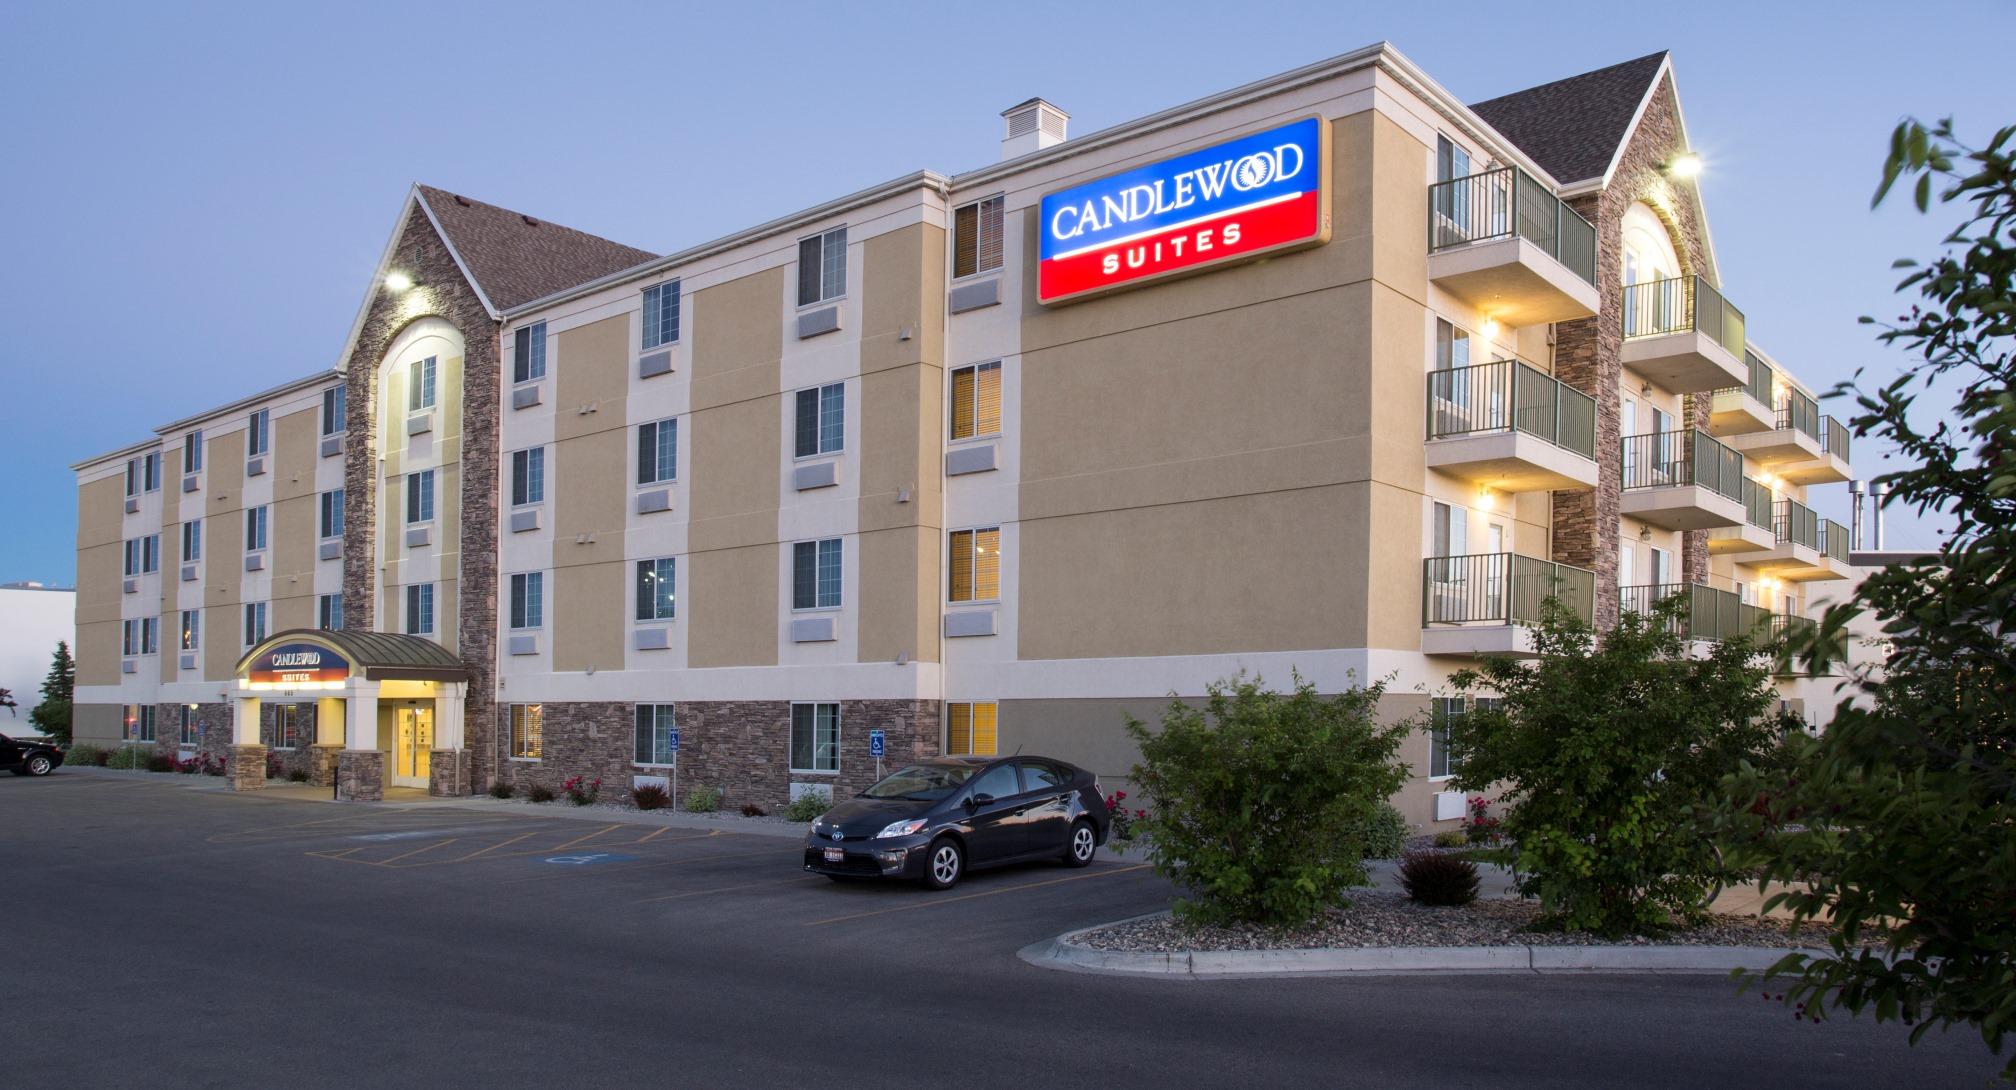 Candlewood Suites - Idaho Falls, ID